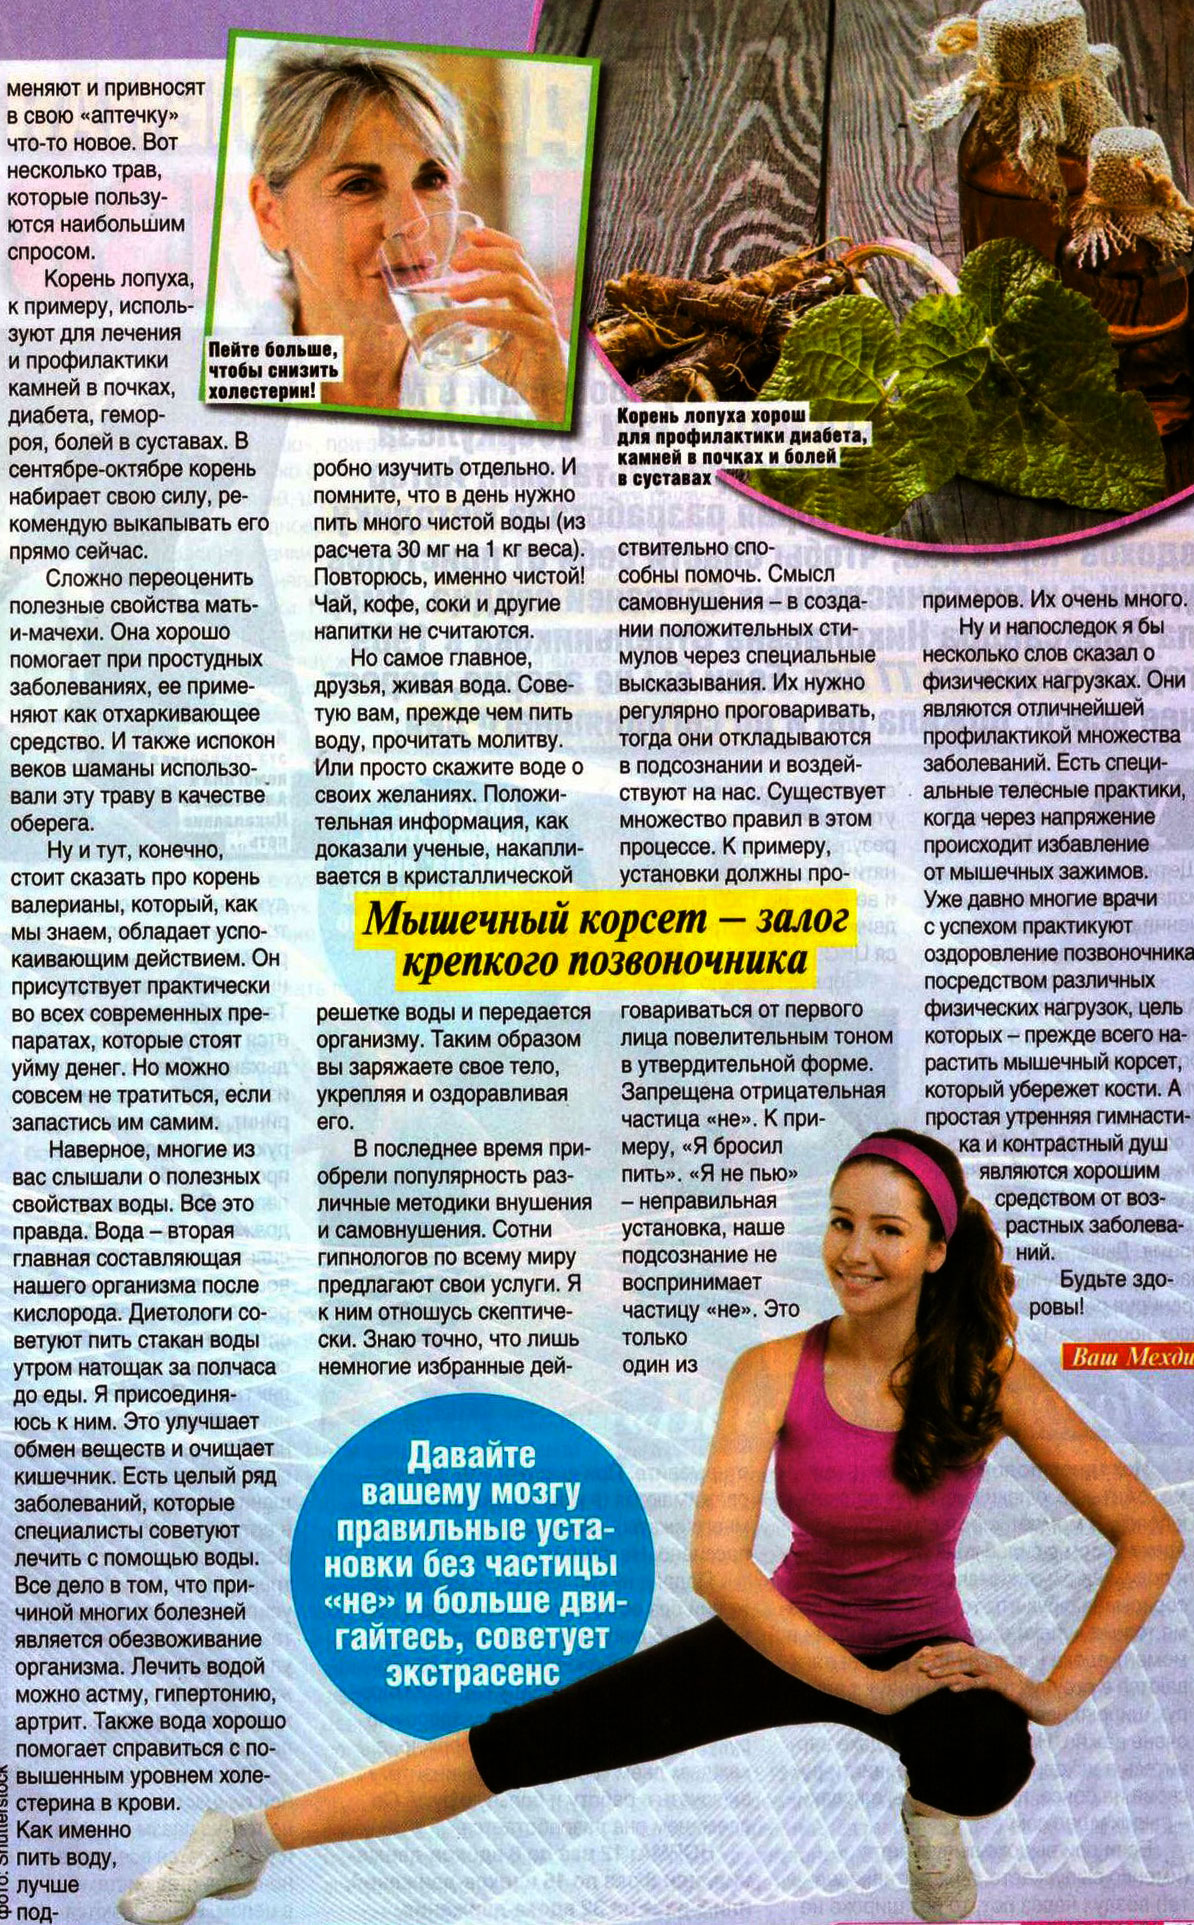 recepti-zdorovia-zvezd-specvipusk2-oktyabr-noyabr-2016